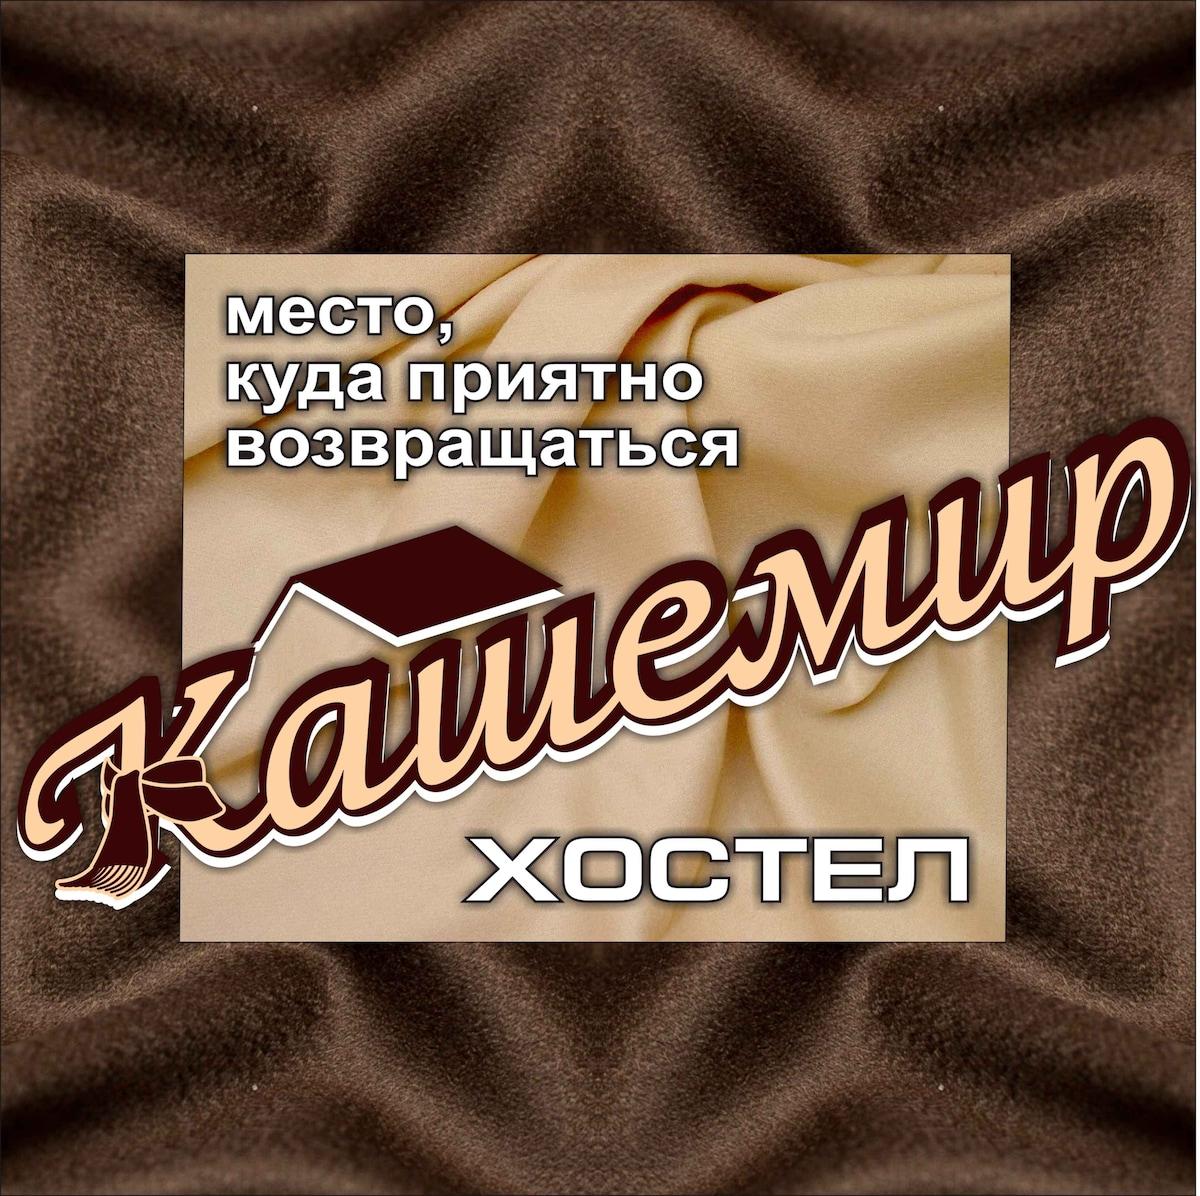 Кашемир / Kashemir from Perm'